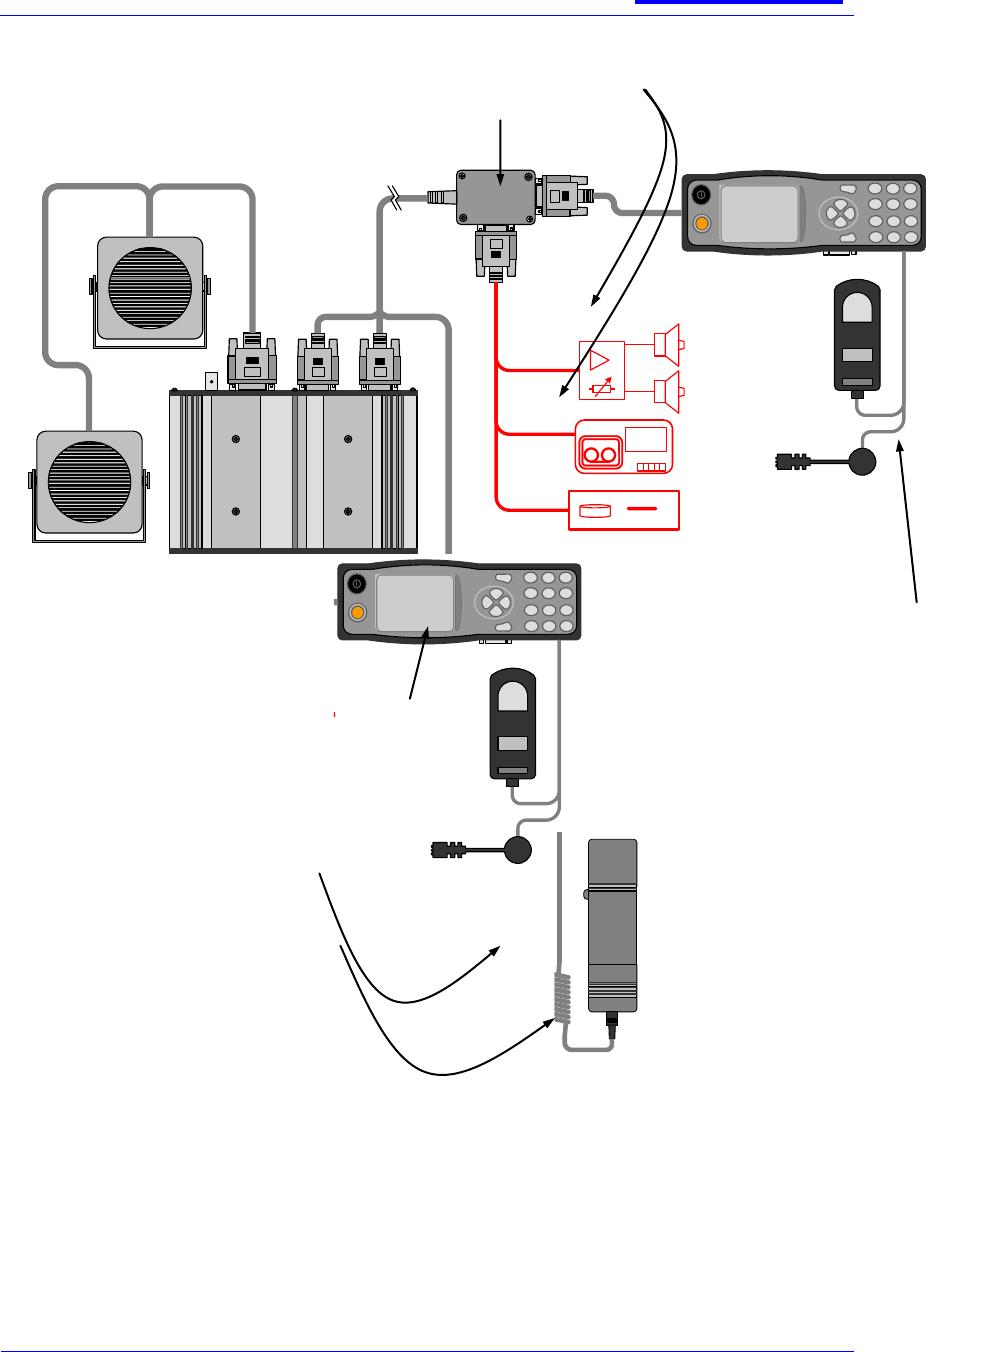 Sepura plc SRG3500XB TETRA Mobile/Gateway Terminal User